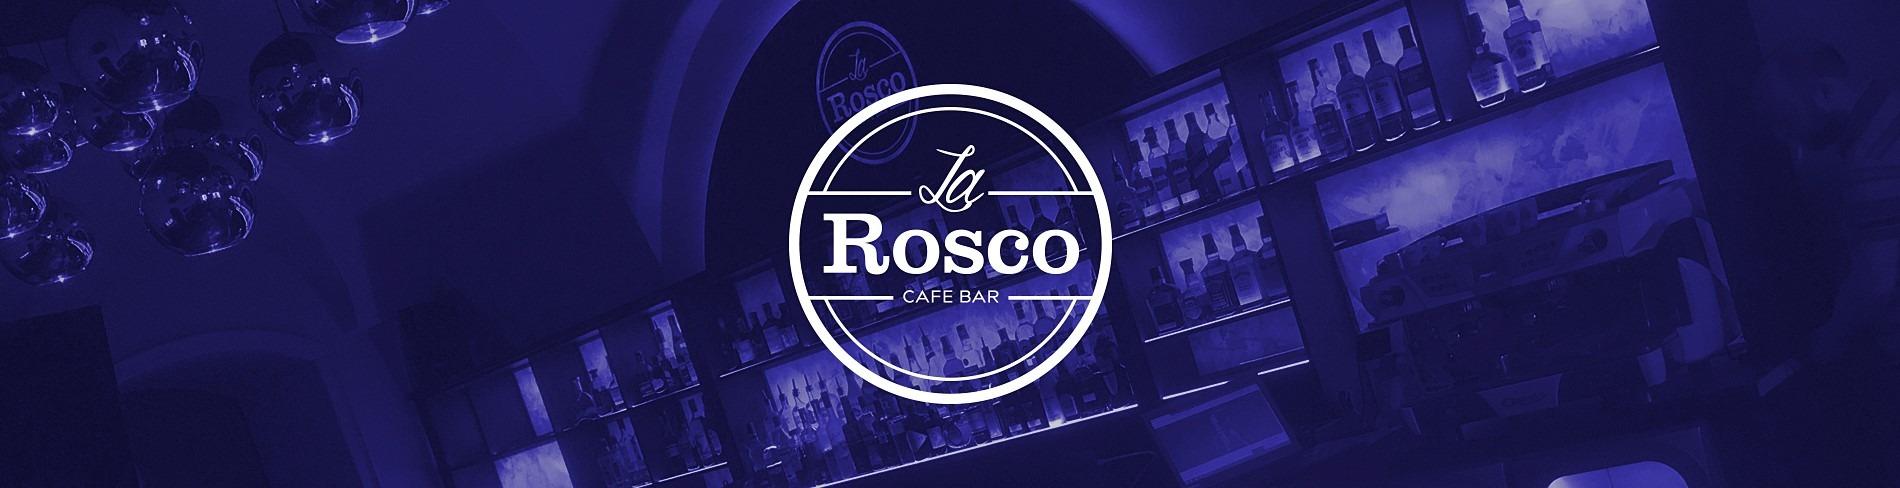 La Rosco Banner